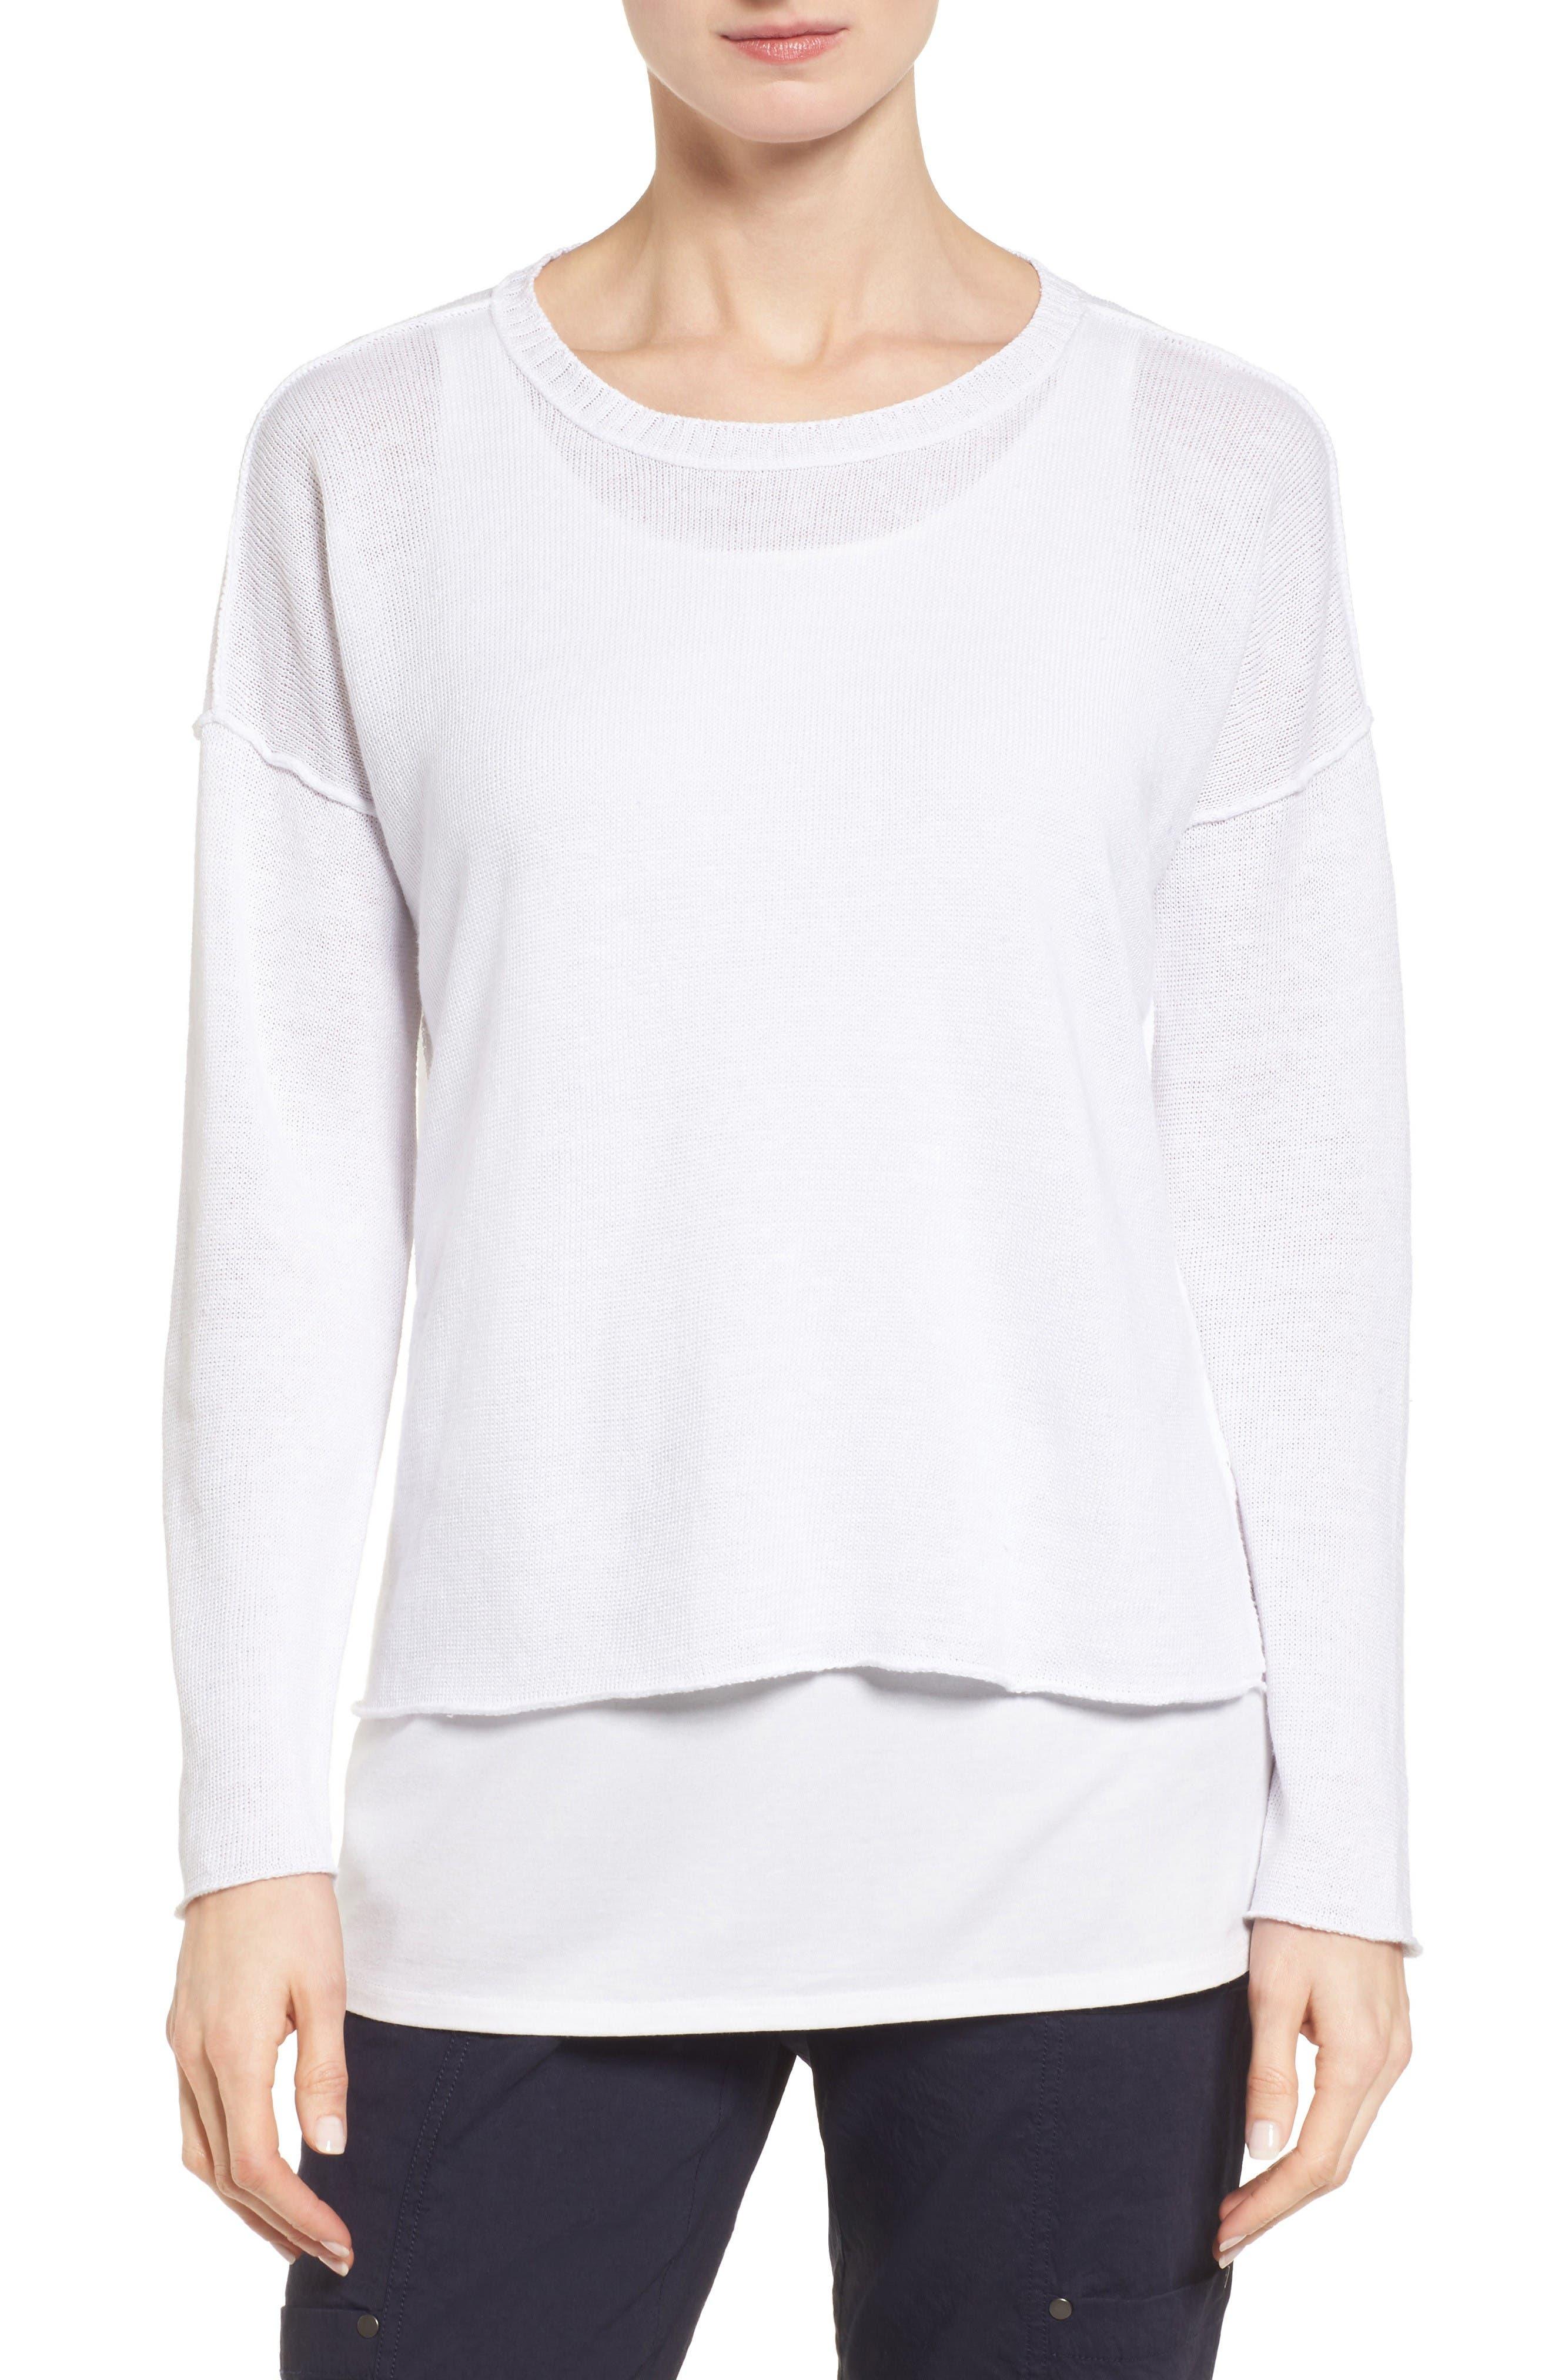 Organic Linen Sweater,                         Main,                         color, White